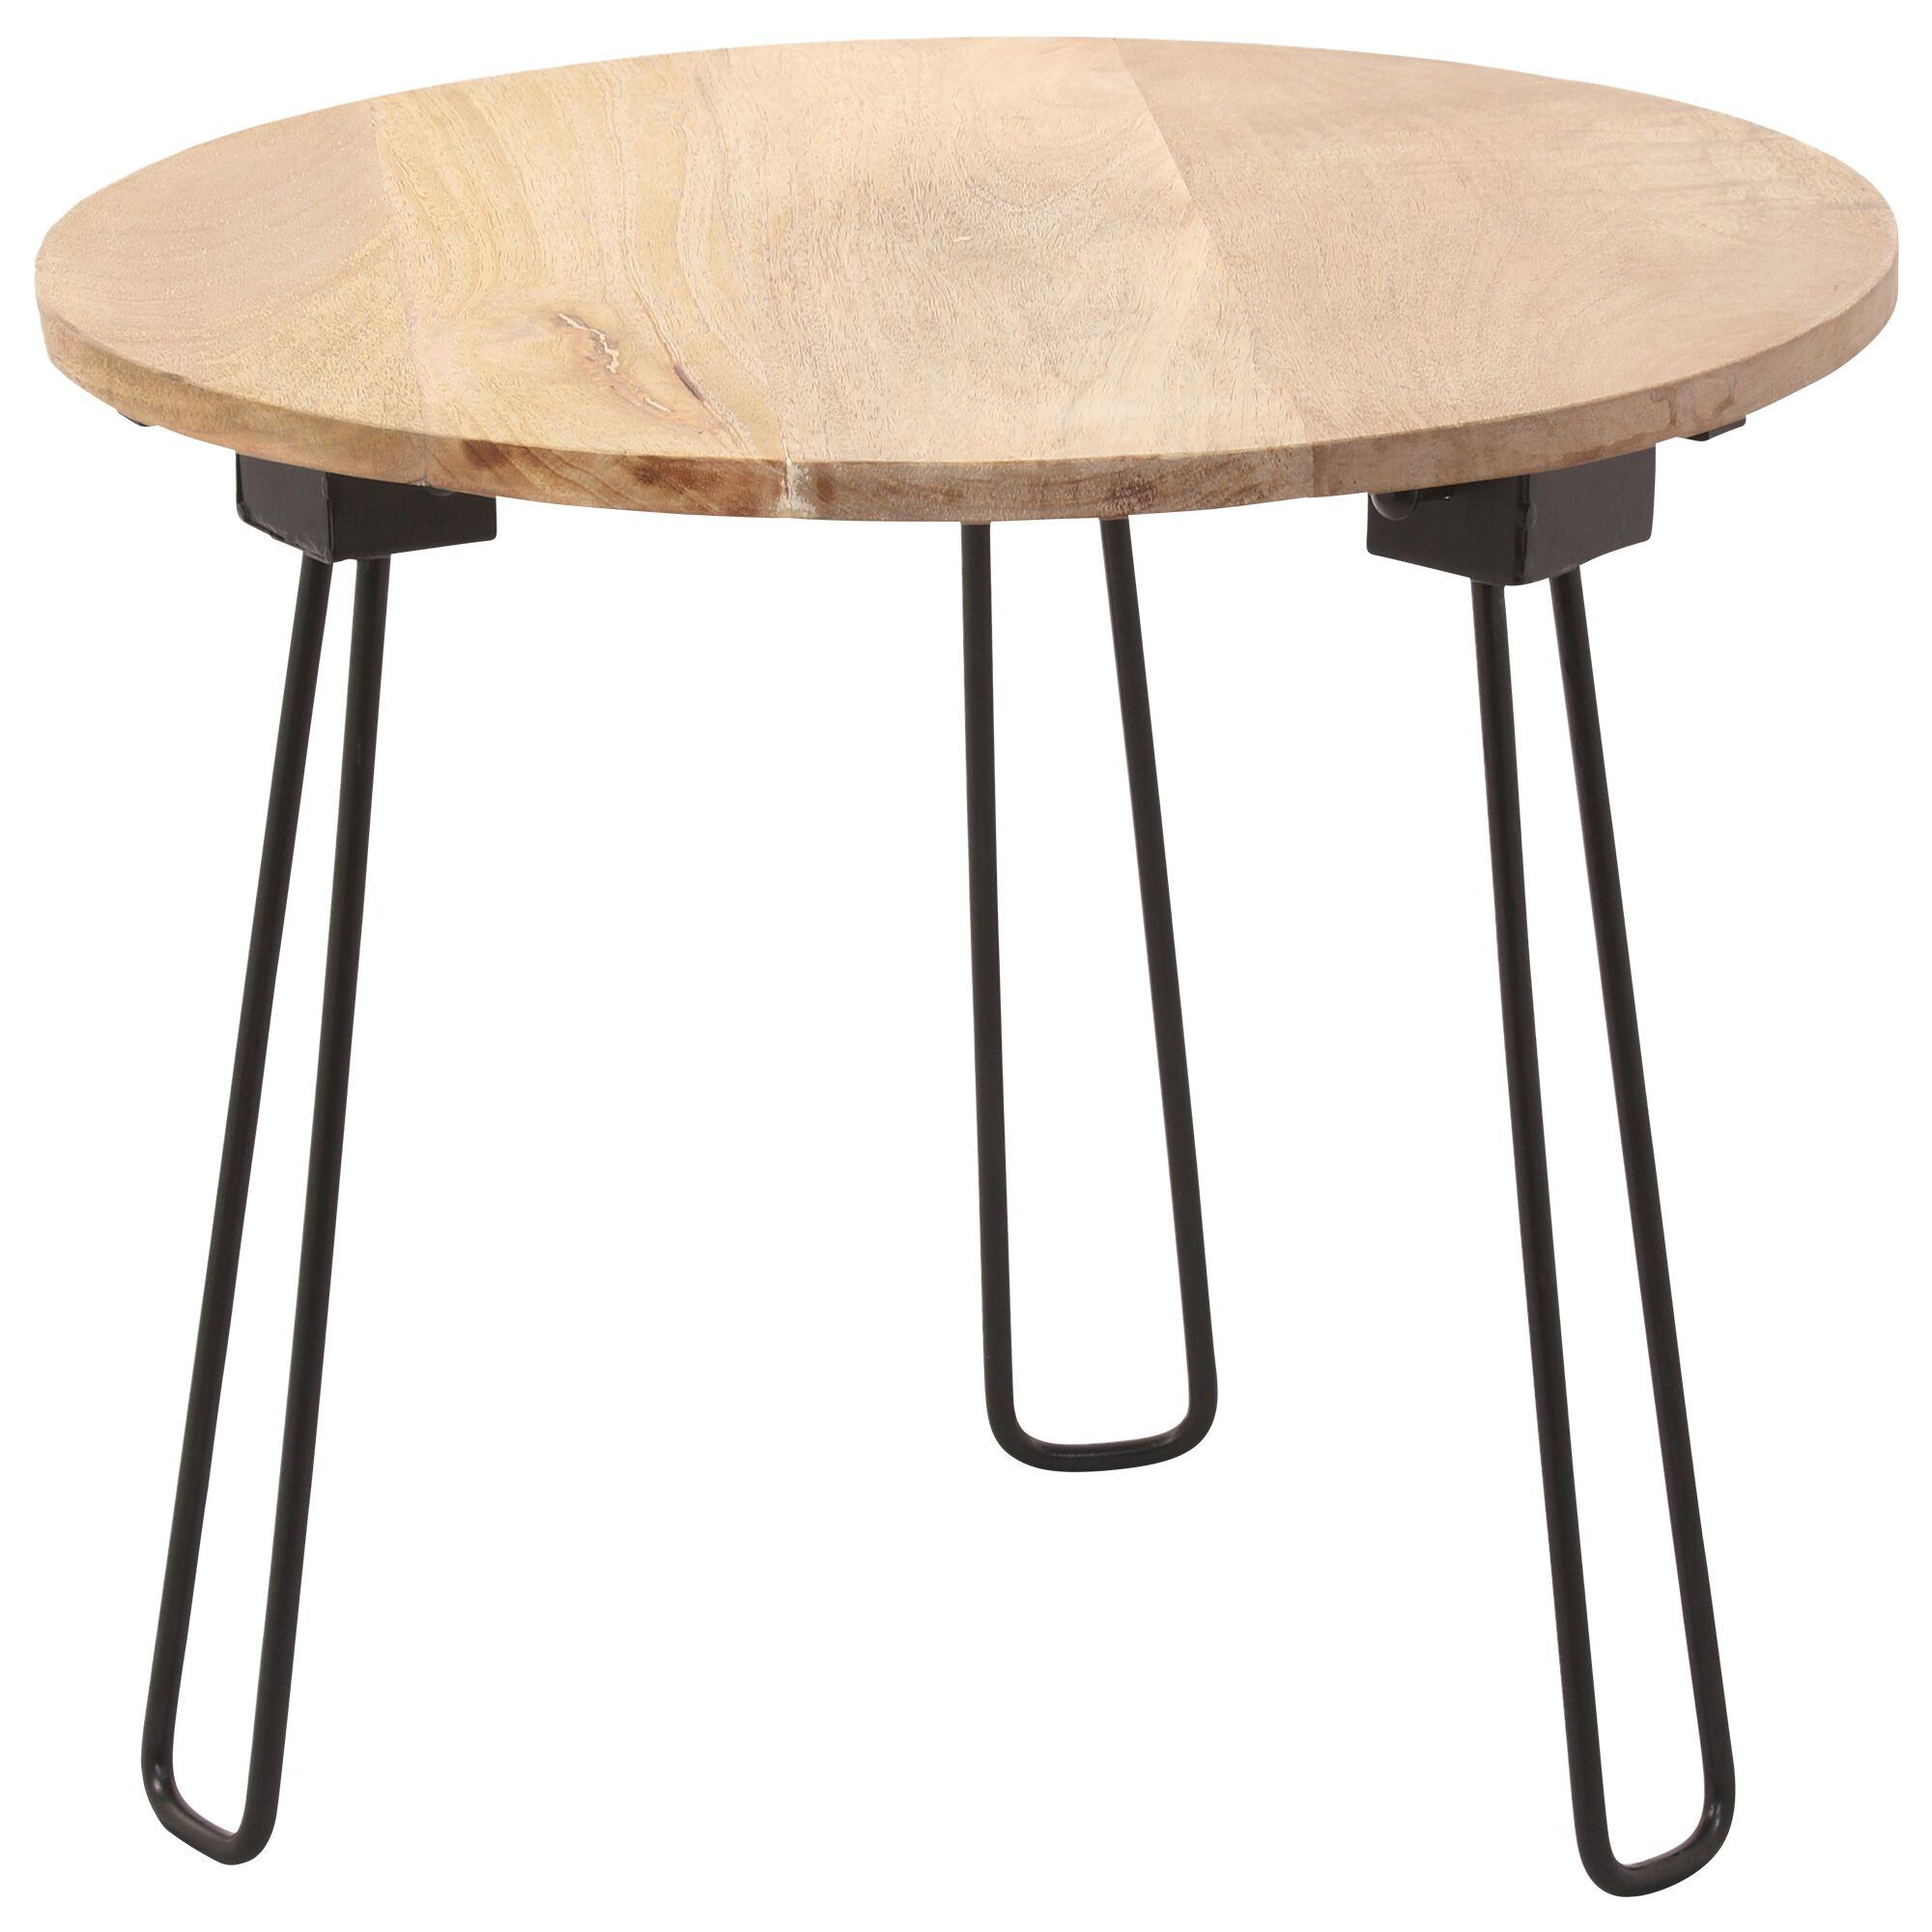 Fransen End Table